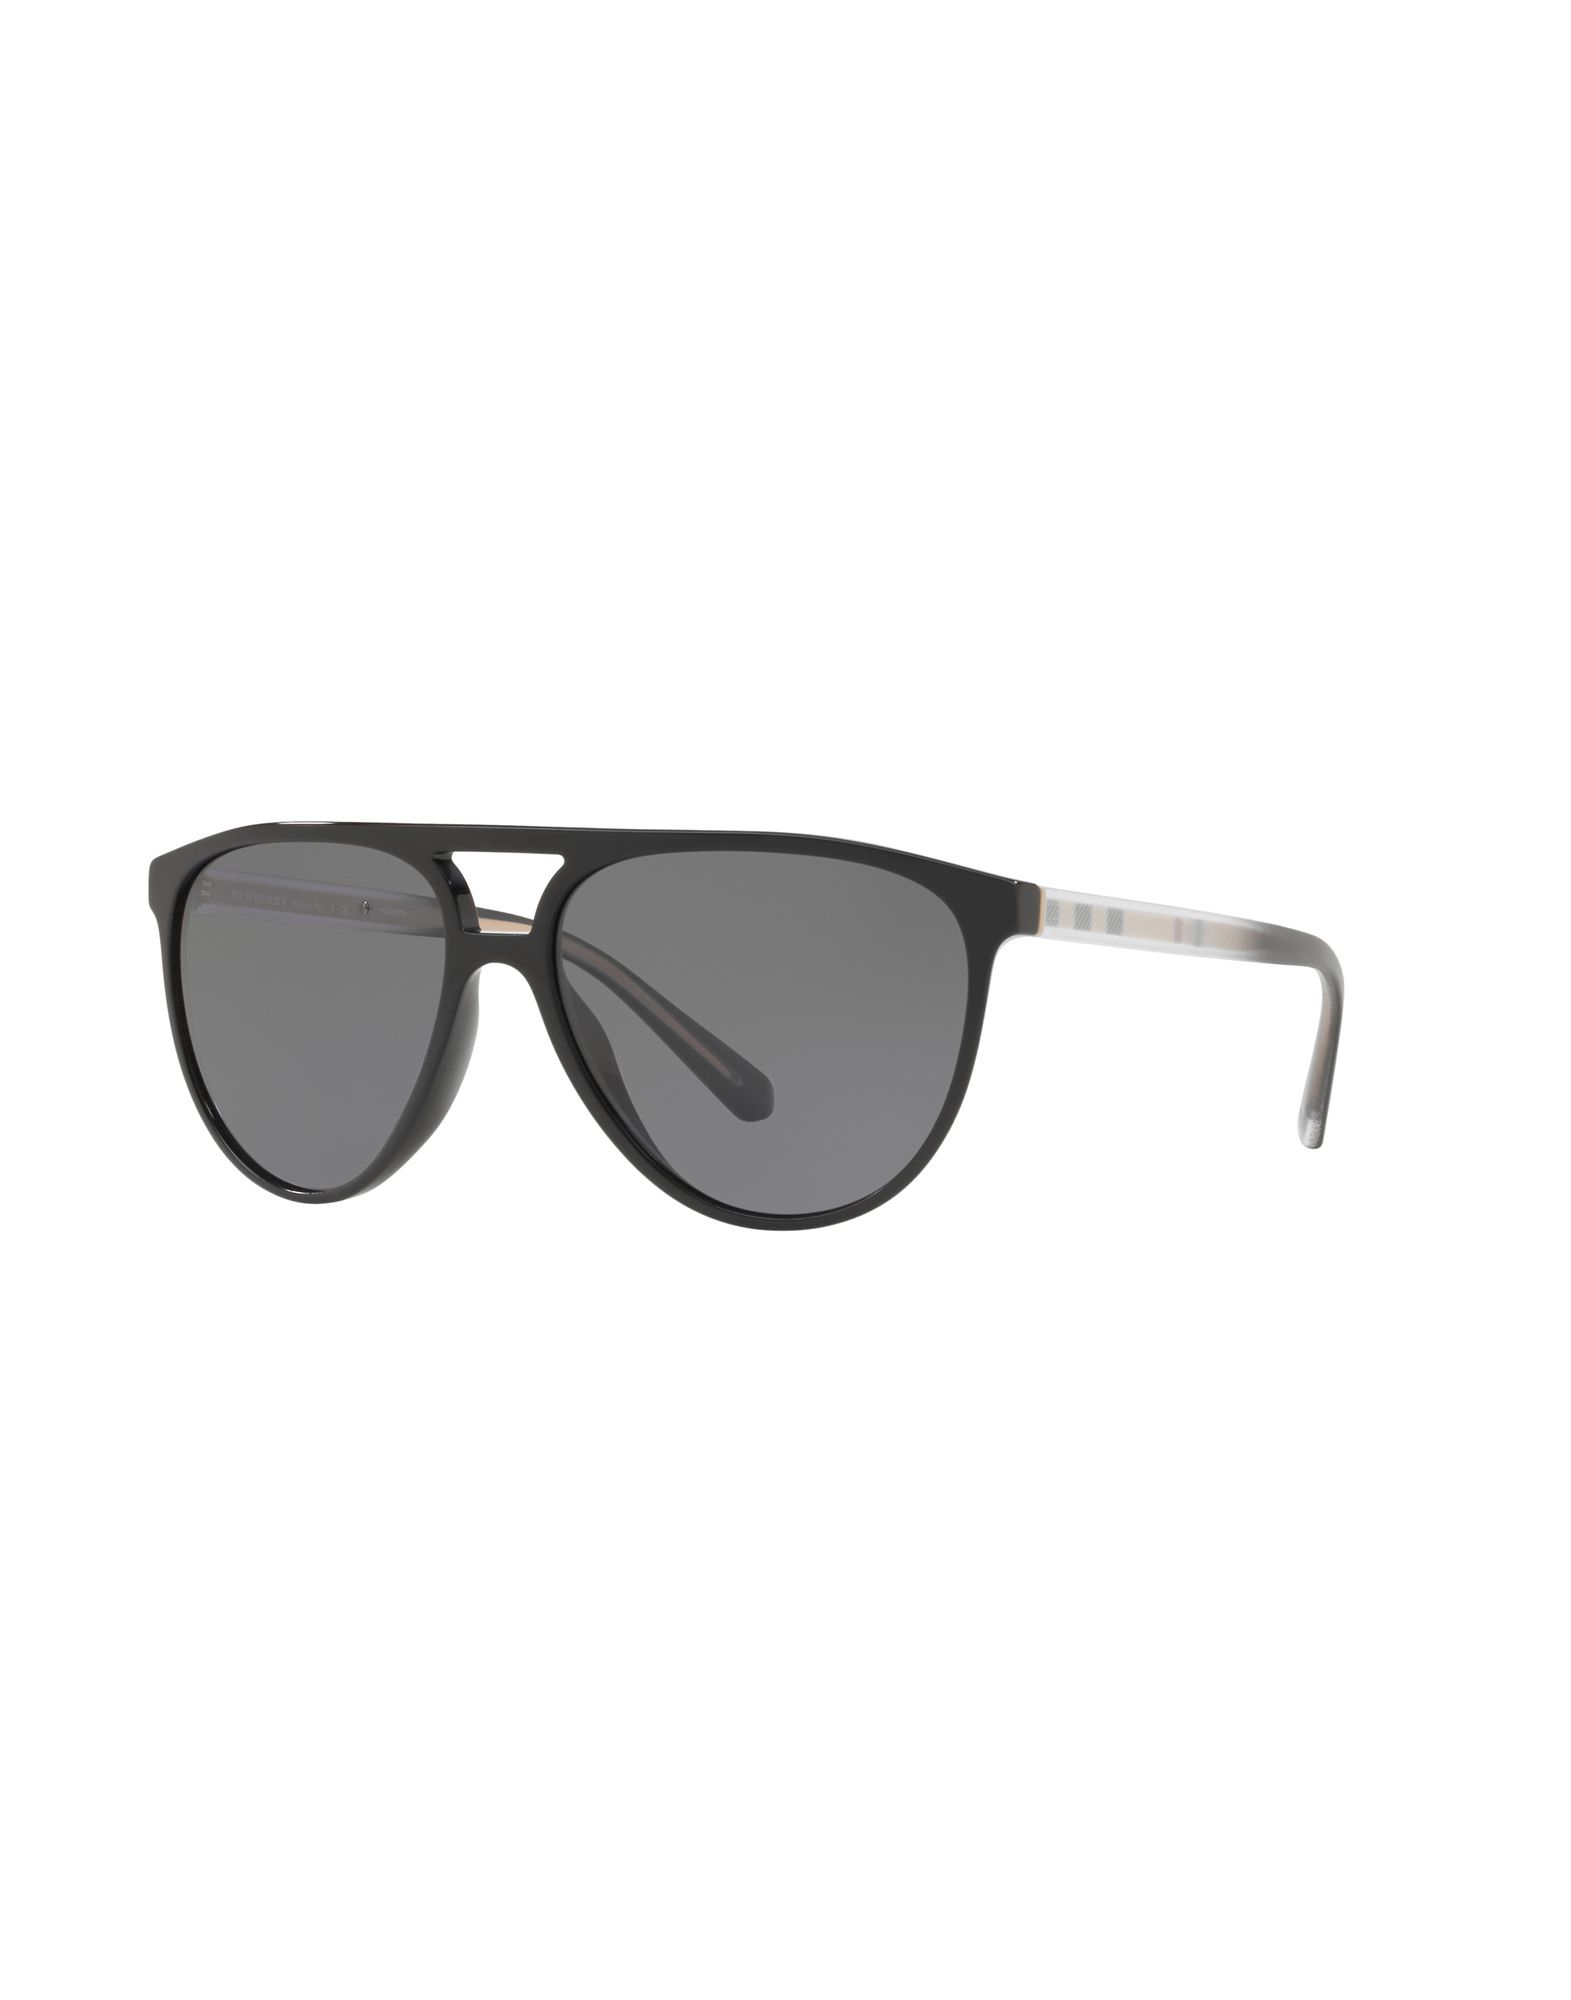 bc03113917b Burberry Be4254 - Sunglasses - Men Burberry Sunglasses online on ...